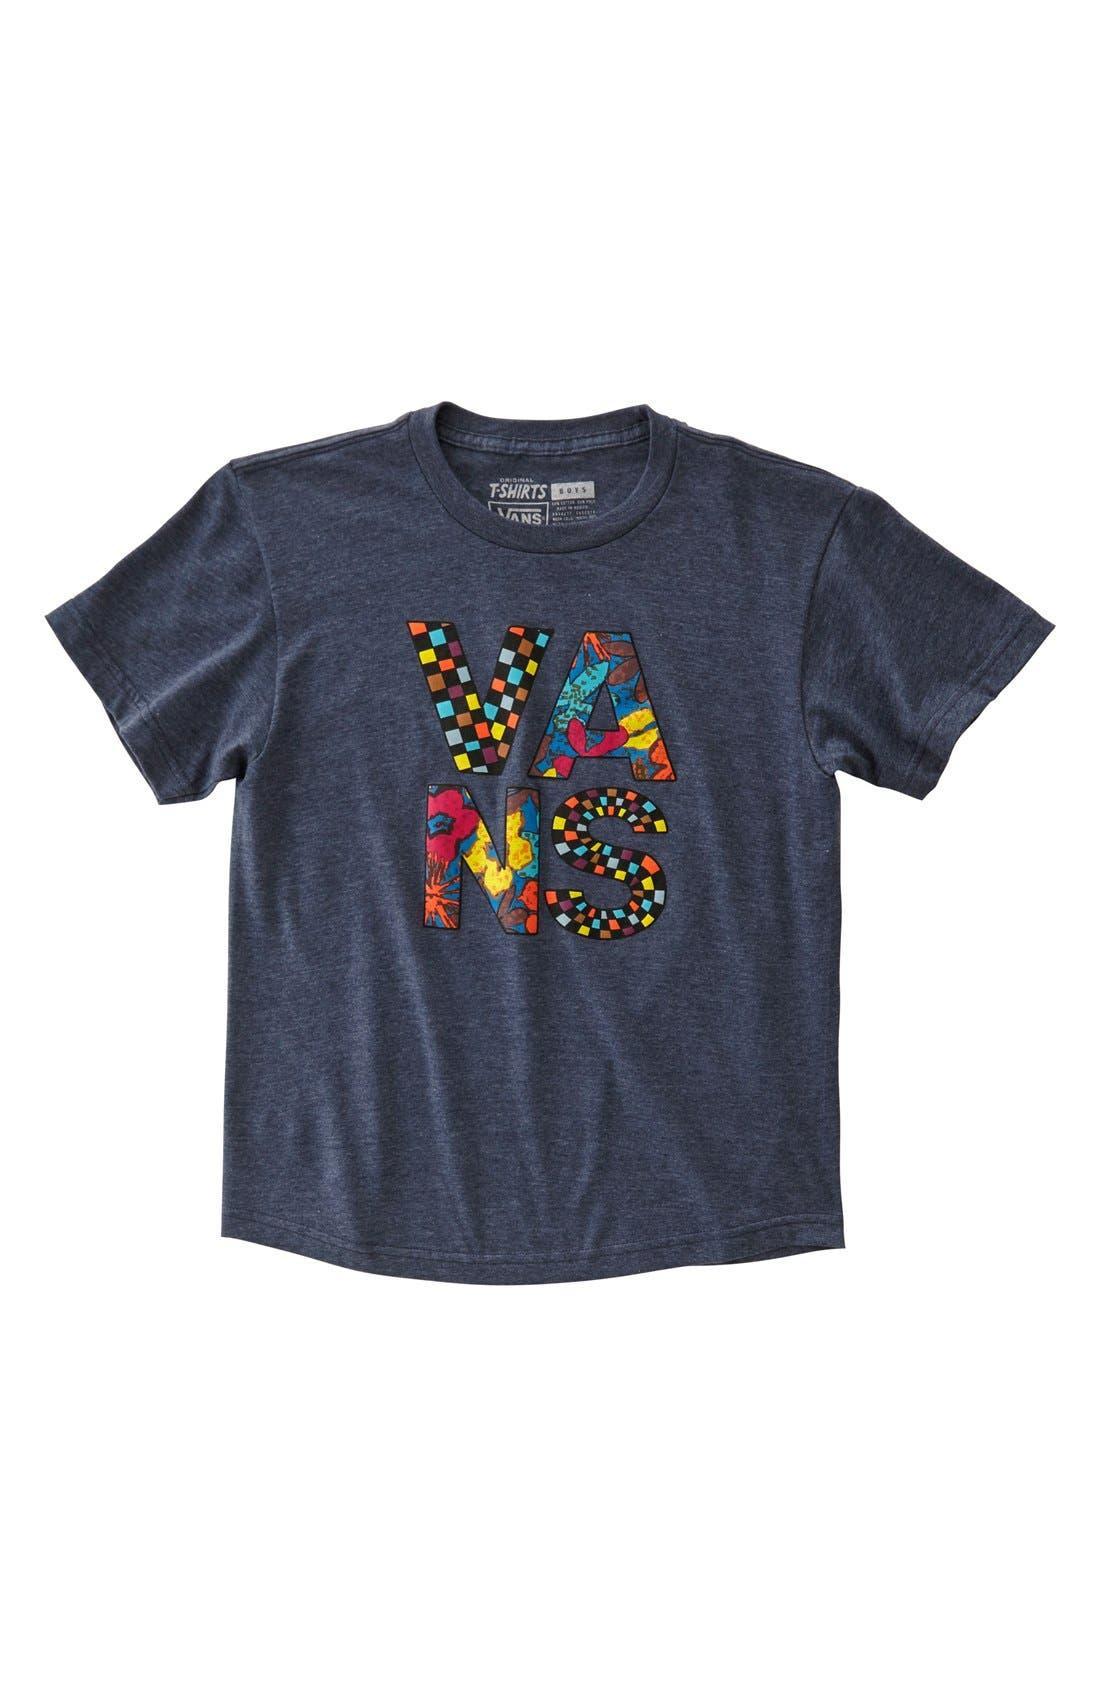 Main Image - Vans 'Typesetter' Graphic T-Shirt (Big Boys)